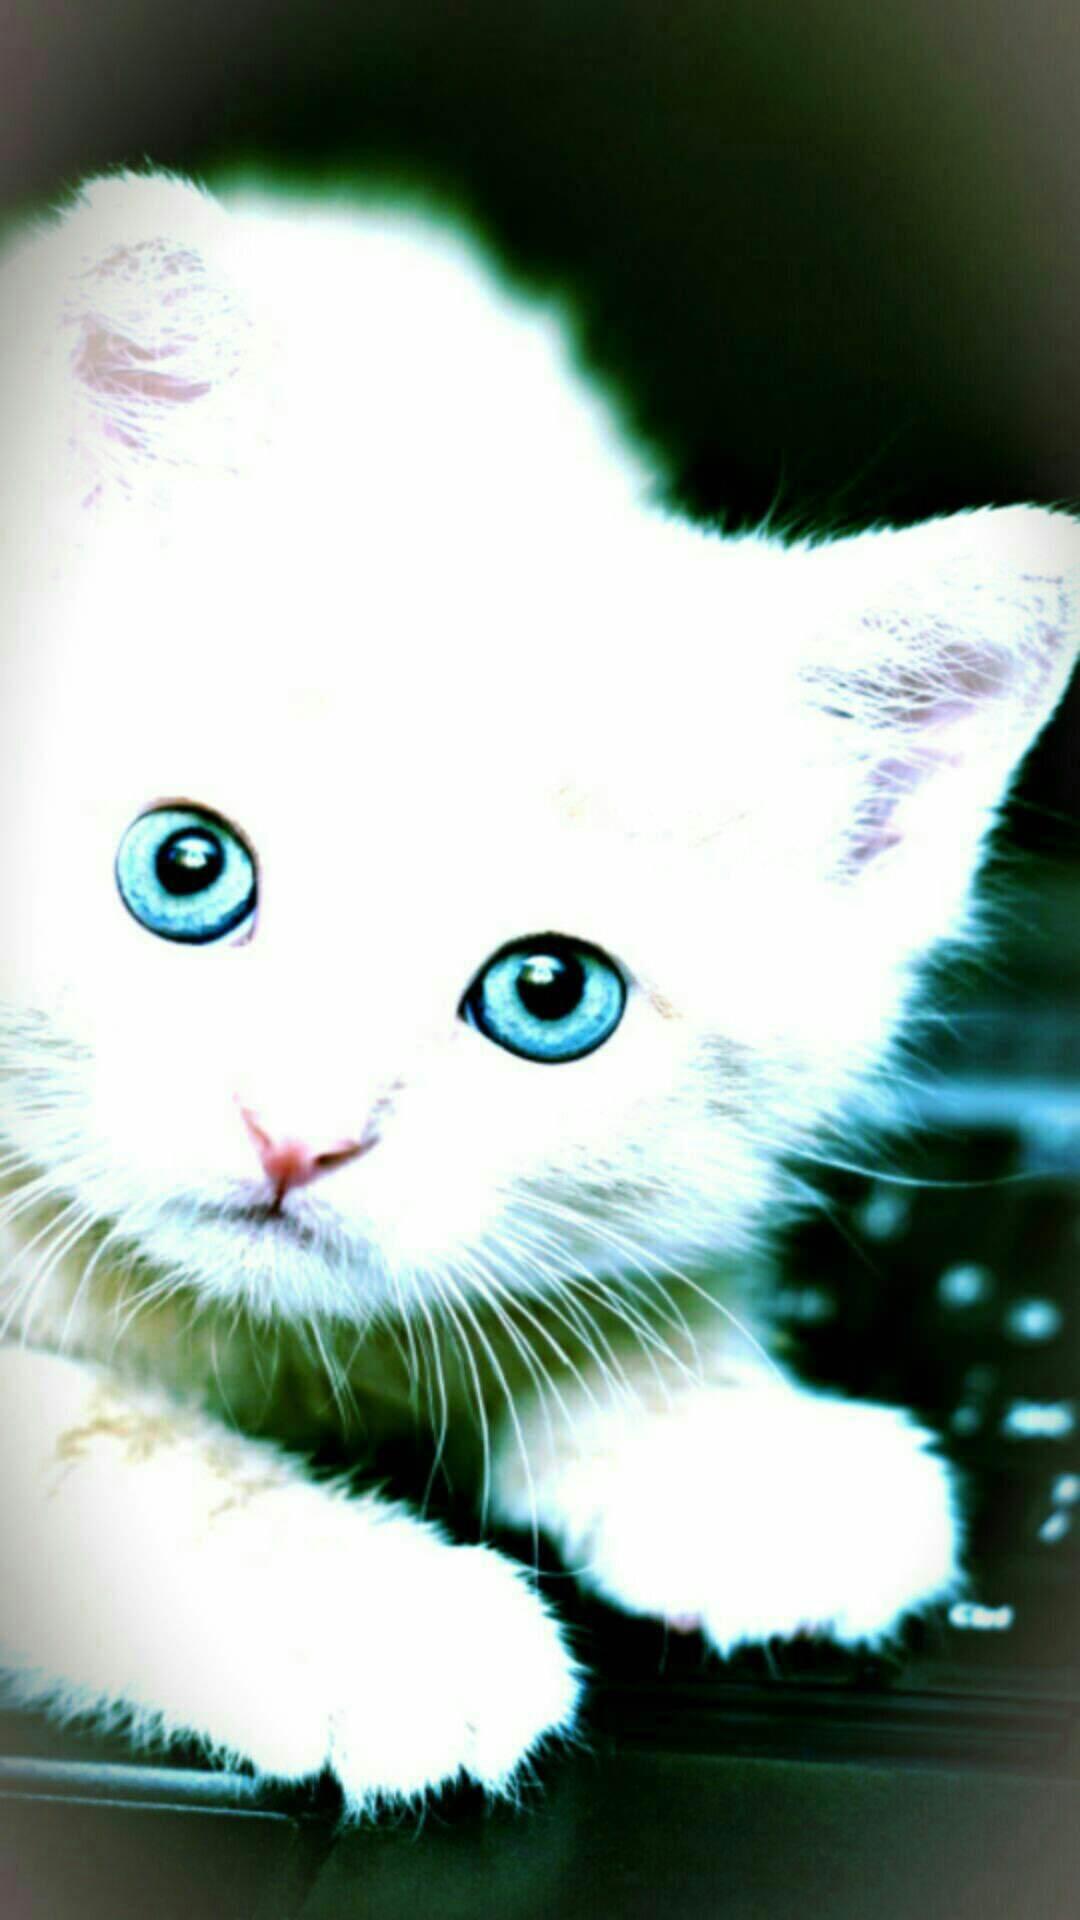 Wallpaper Kucing Lucu Bergerak Gif 1080x1920 Download Hd Wallpaper Wallpapertip